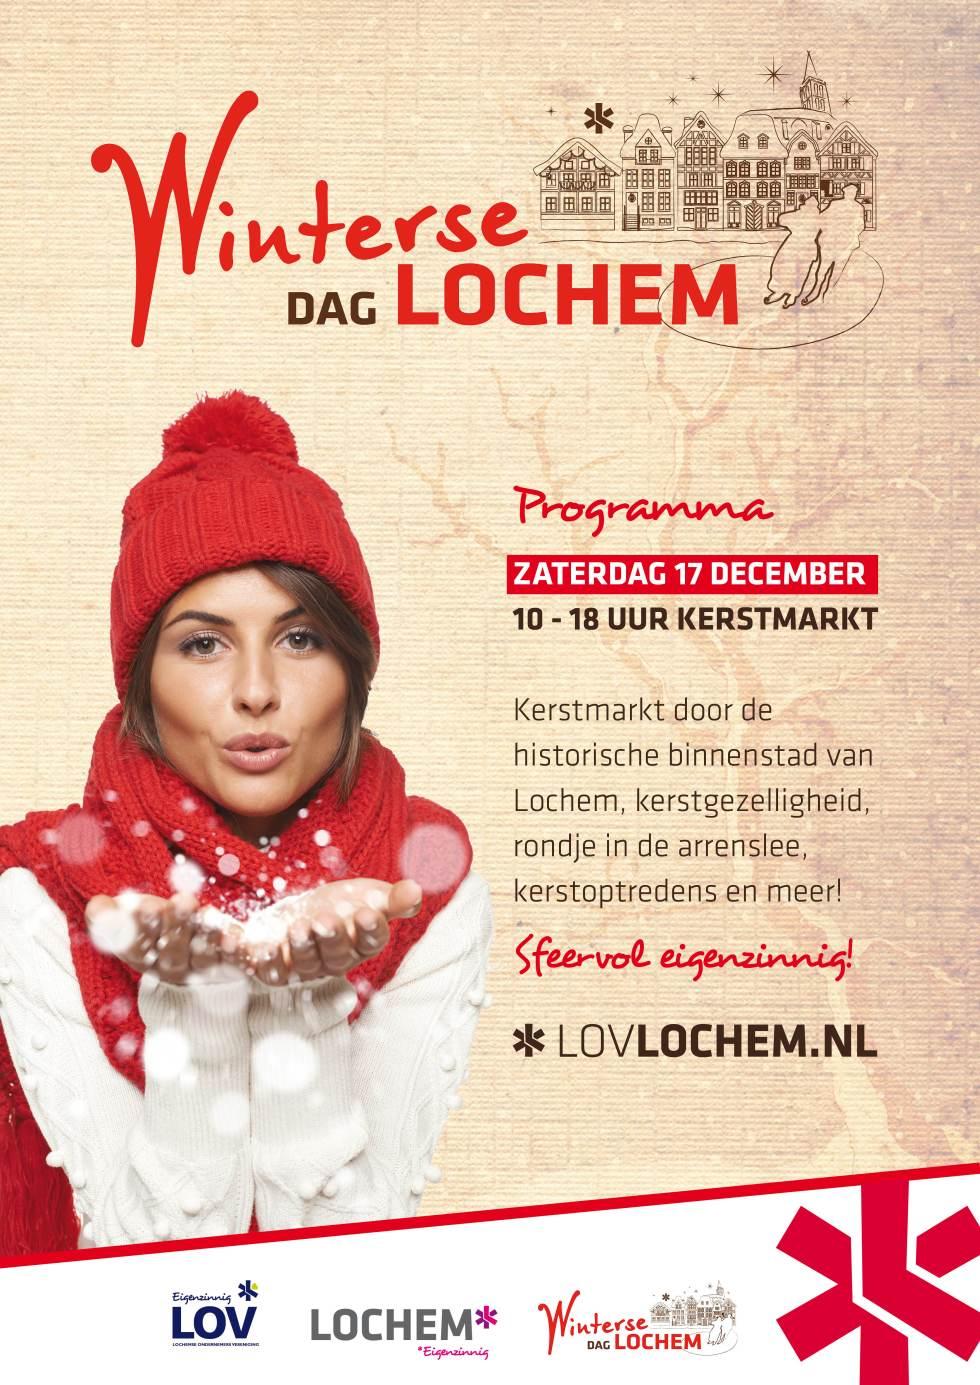 2160251-winterse-dag-lochem-2016-poster-a3